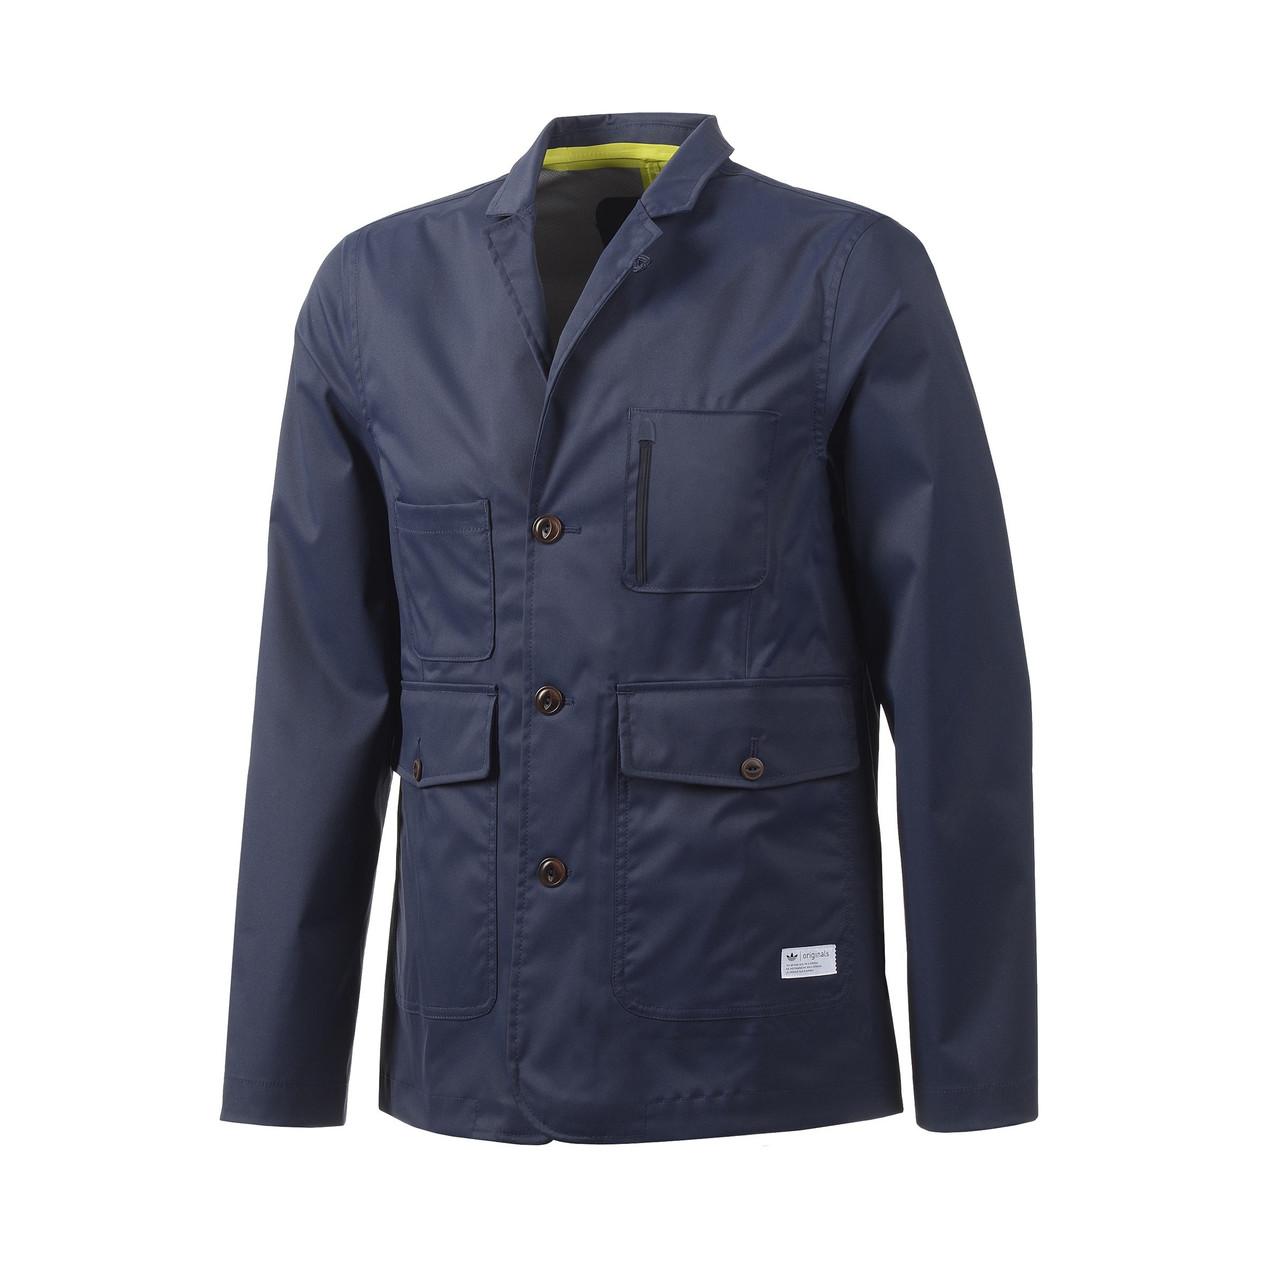 Блейзер спортивный мужской adidas Tech Blazer F50155 (синий, летний, на пуговицы, casual, логотип адидас)